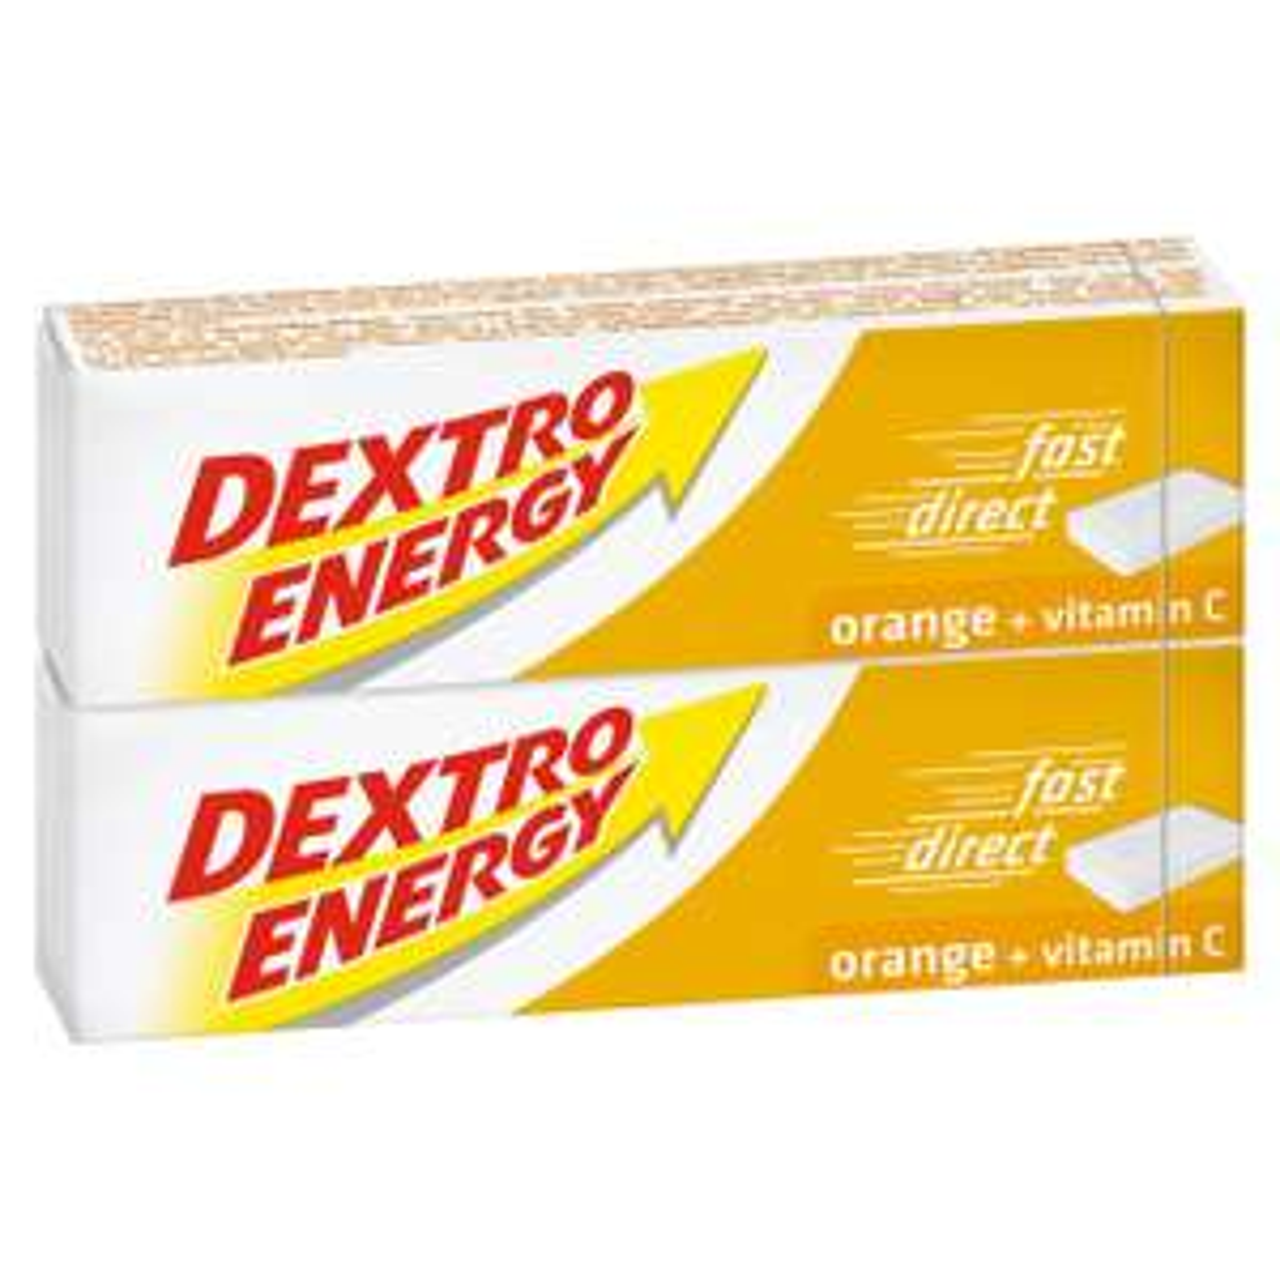 2X Twin Packs Dextro Orange Energy Tablets 40p / Blackcurrant 54p (Minimum basket charge applies) @ Ocado